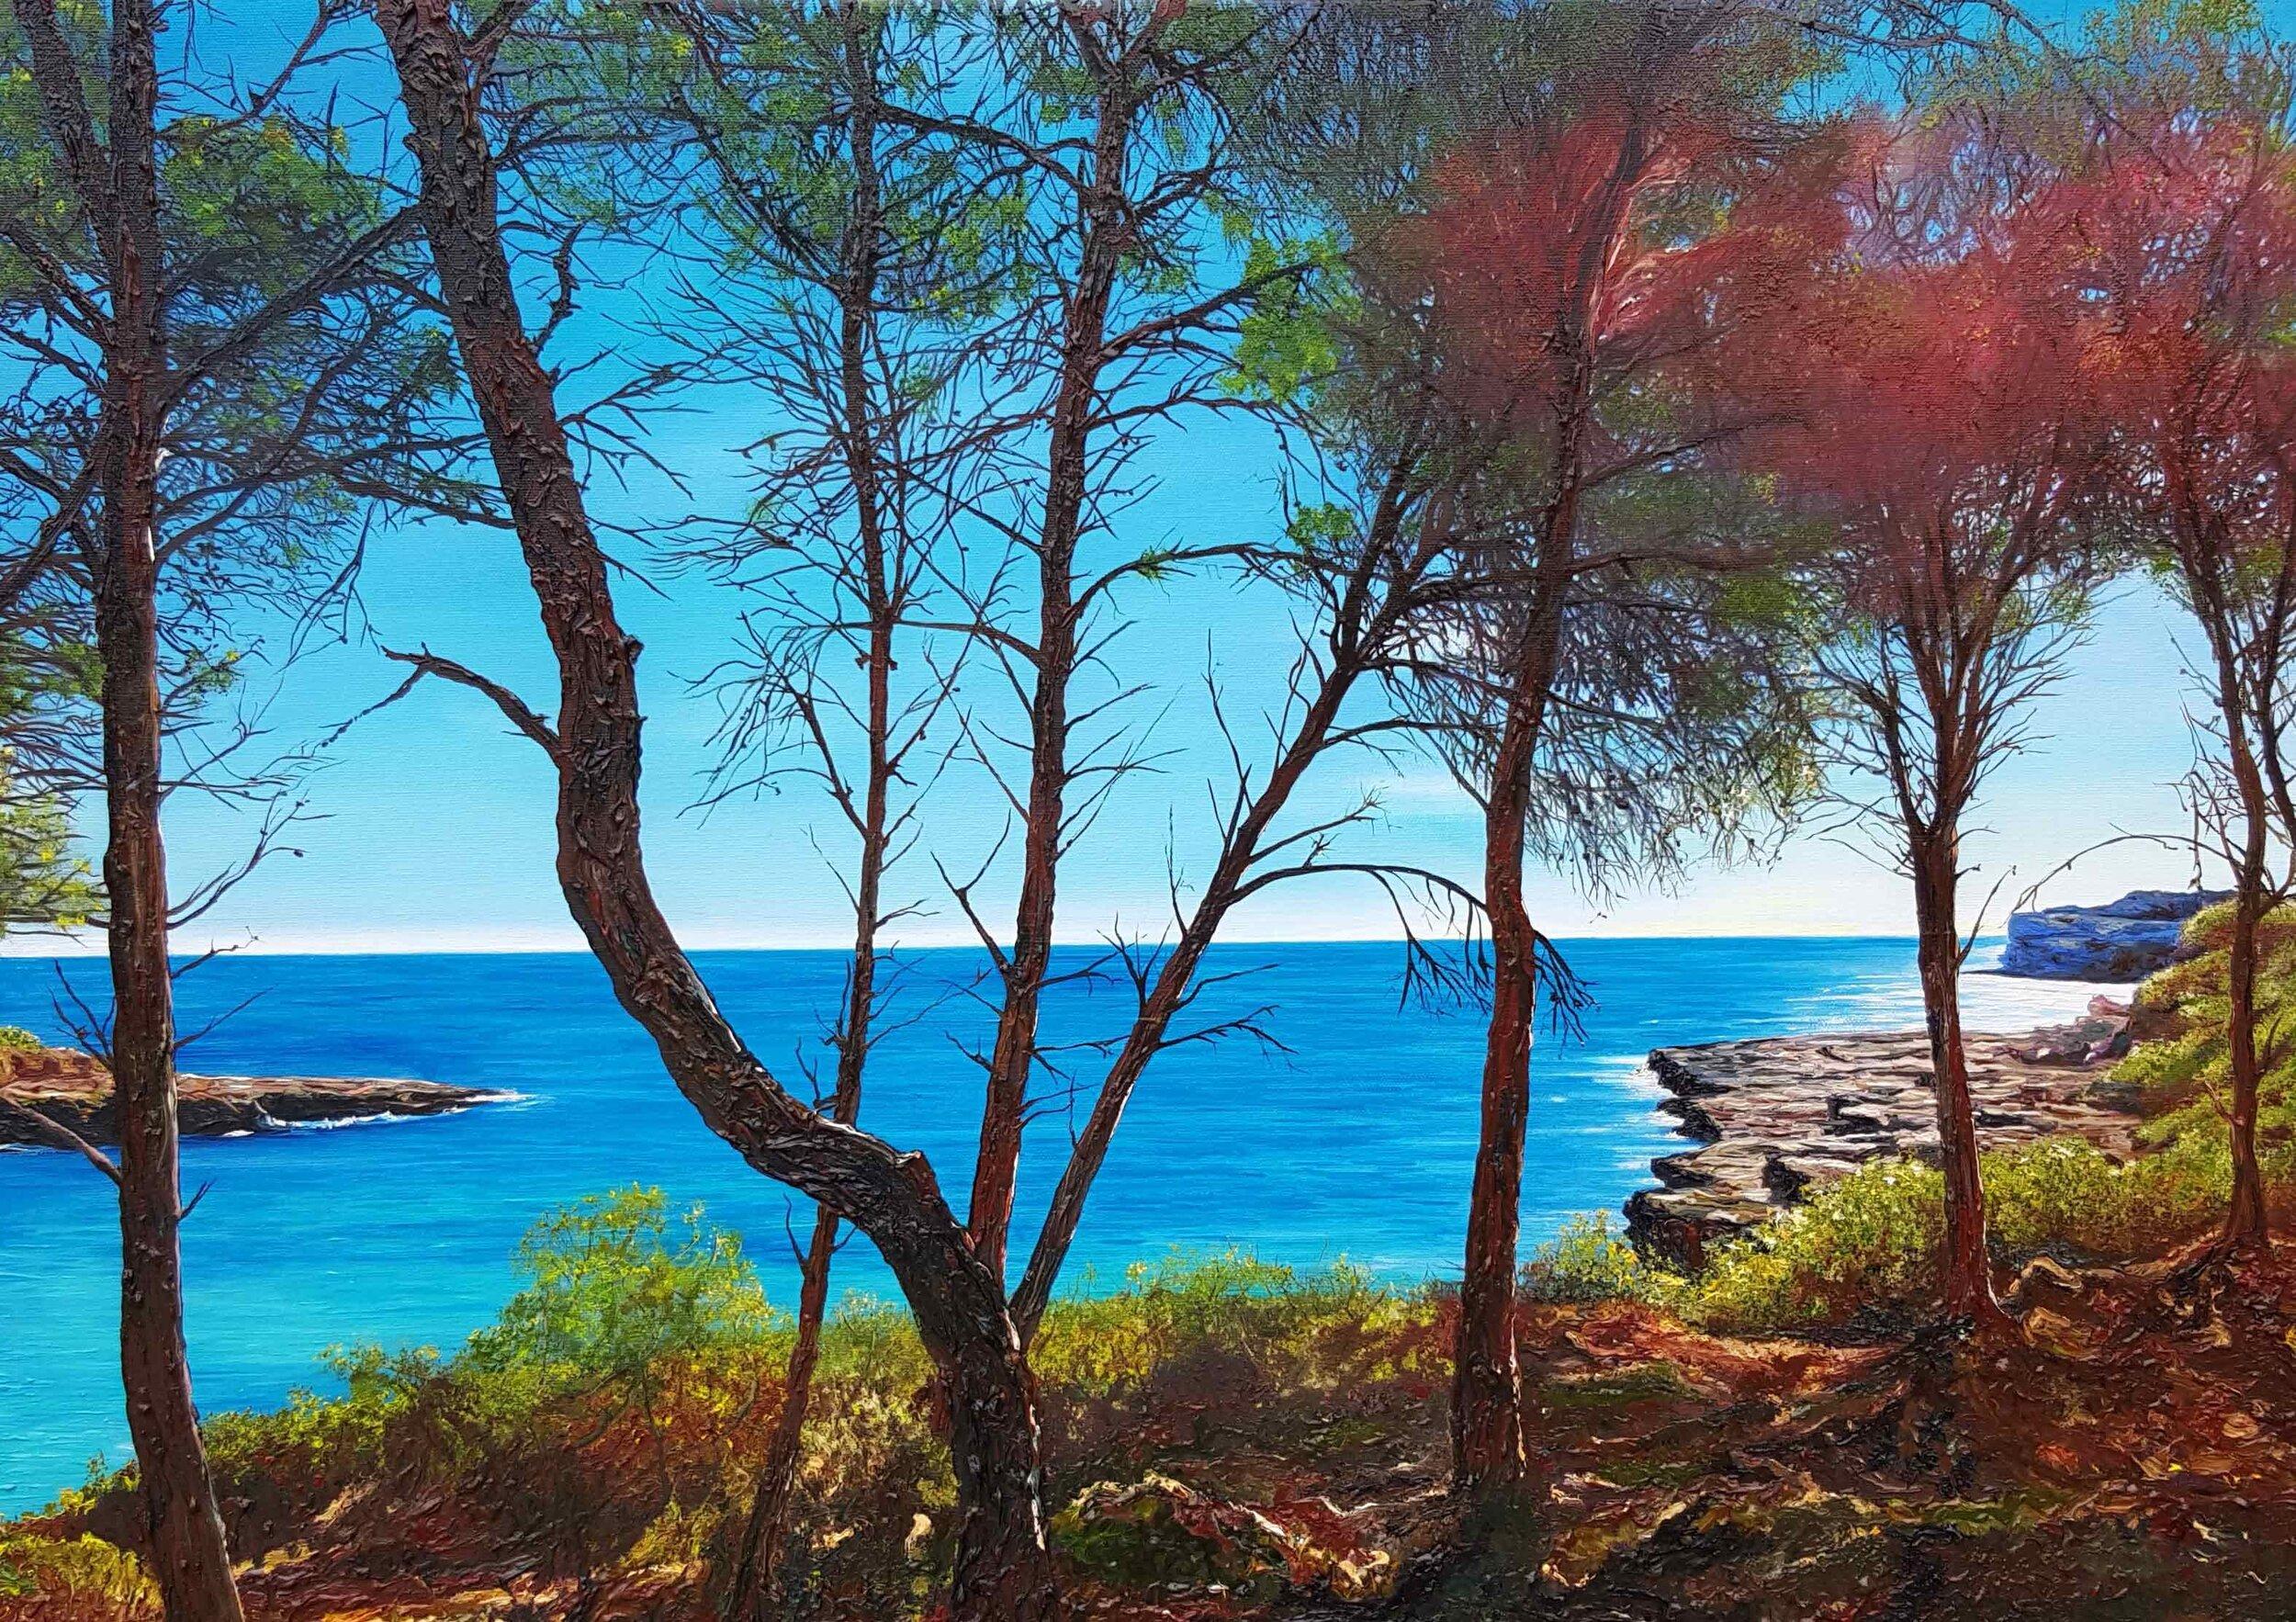 'Cala Burgit' , 2016, Oil on canvas, 50 x 70 cm (20 x 27.5 in).